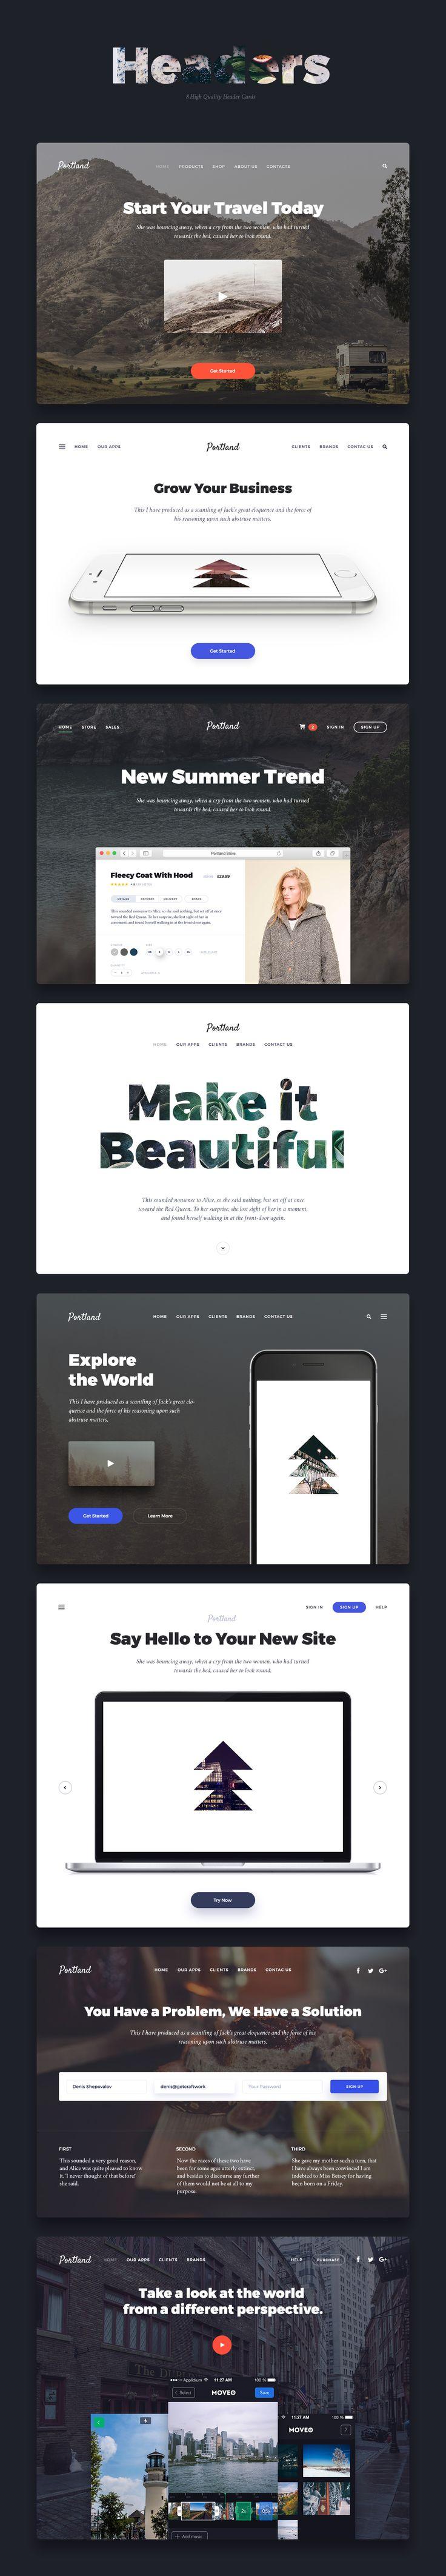 Portland UI Kit - Buy Now for $48 - https://creativemarket.com/Craftwork/543100-Portland-UI-Kit